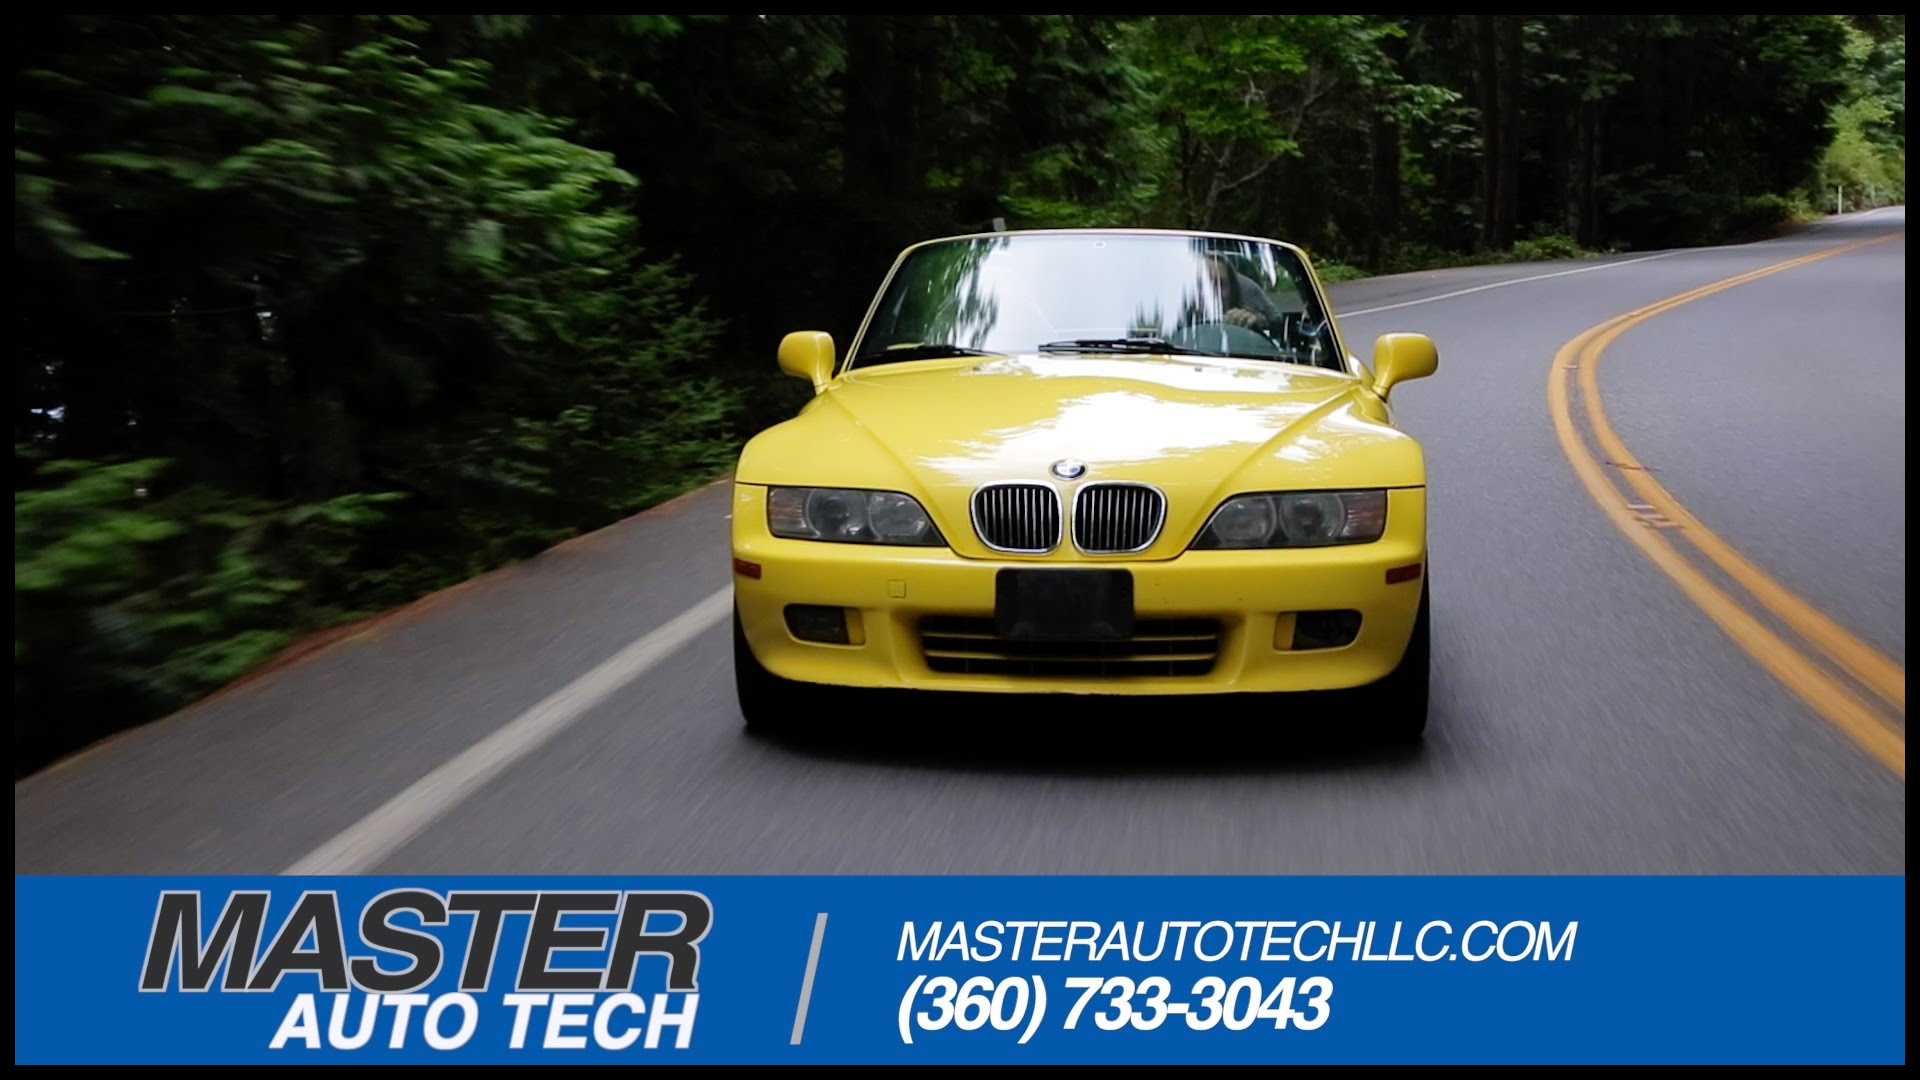 Bellingham Auto Service and Repair Master Auto Tech